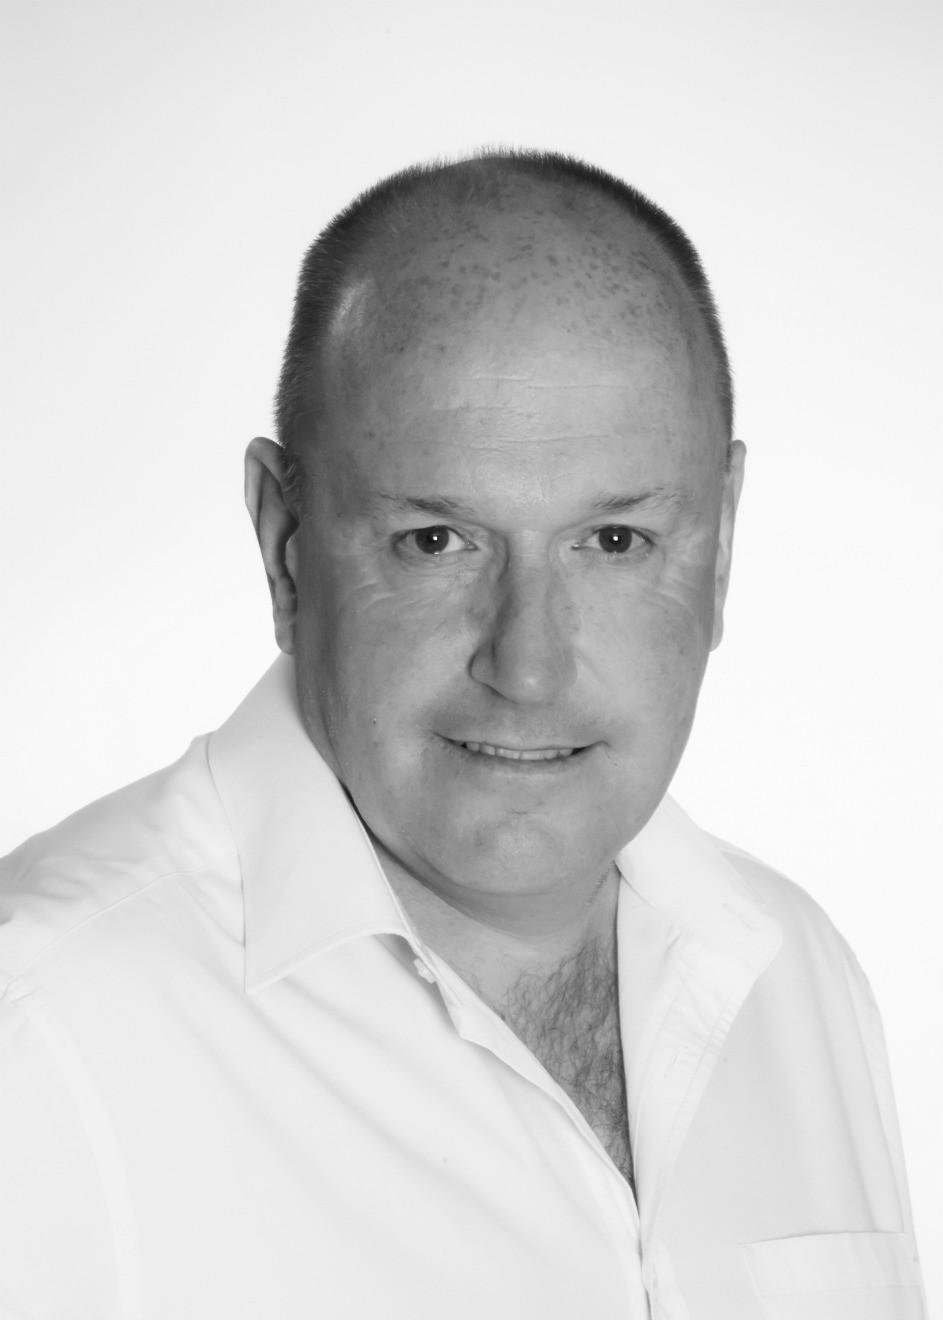 Peter Lindsey